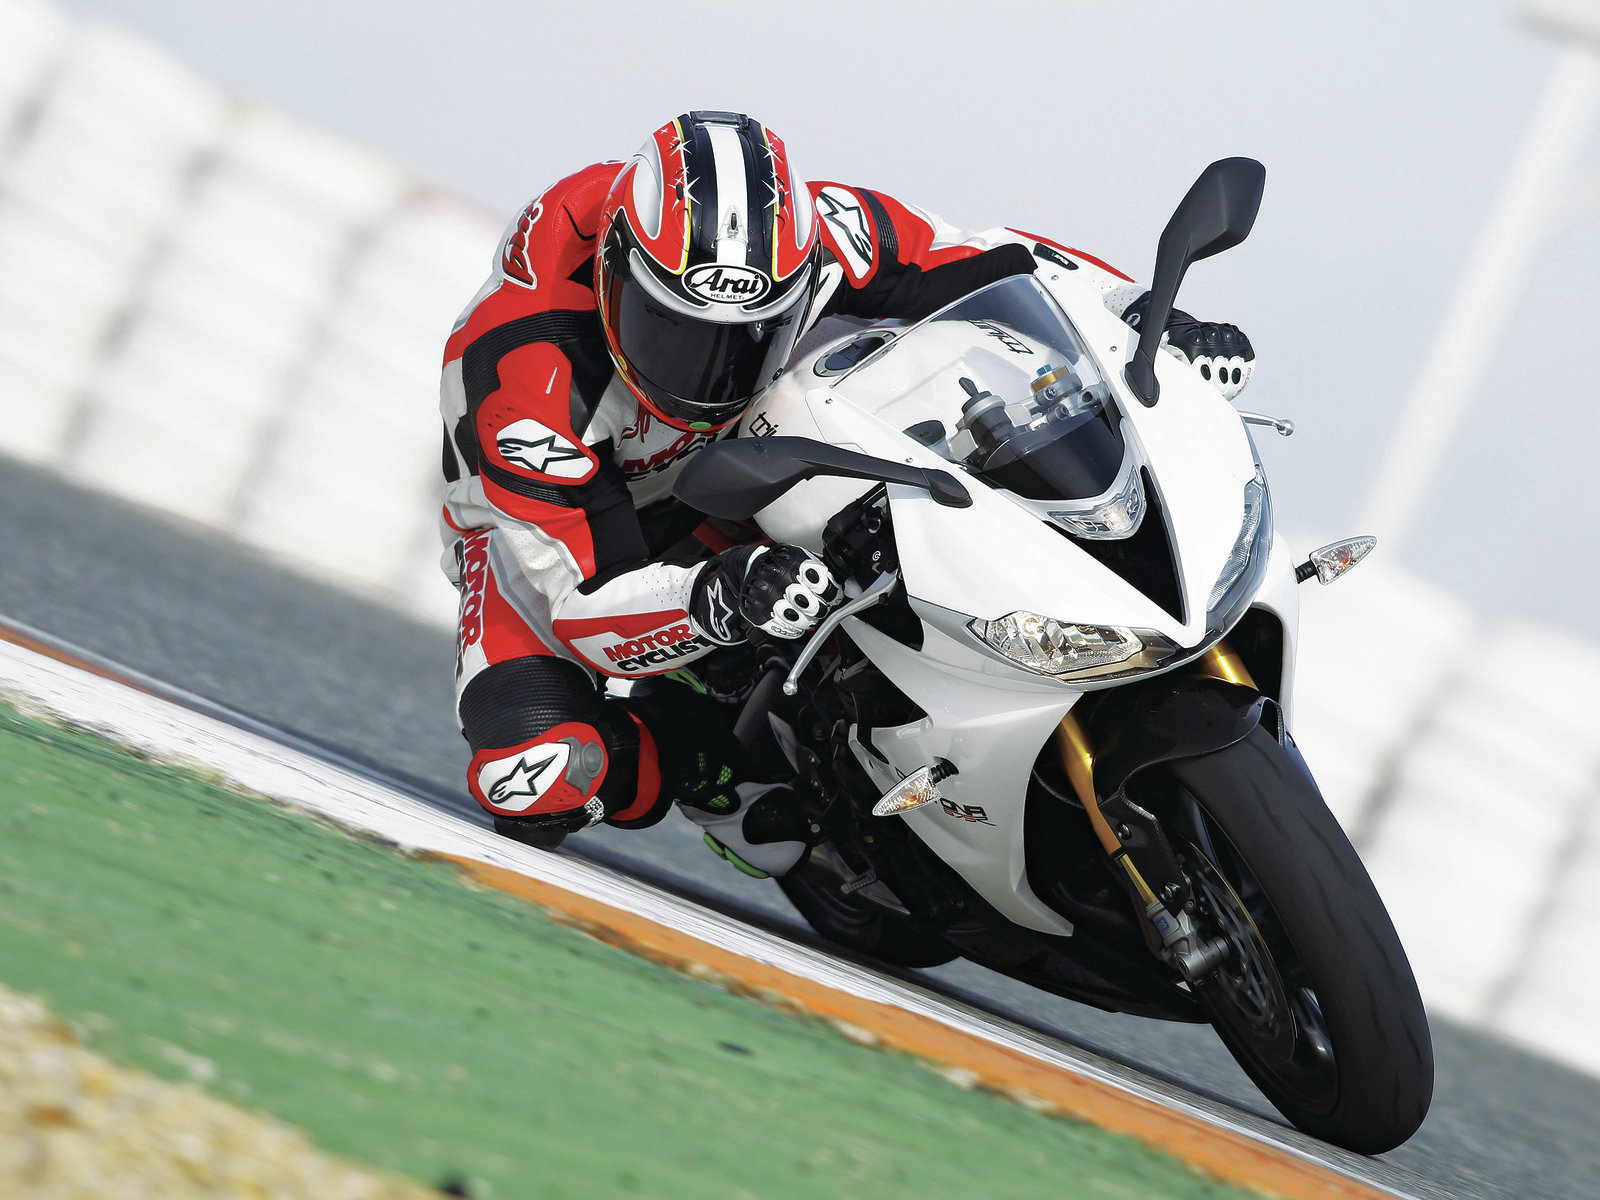 2013 Triumph Daytona 675r Motorcyclist